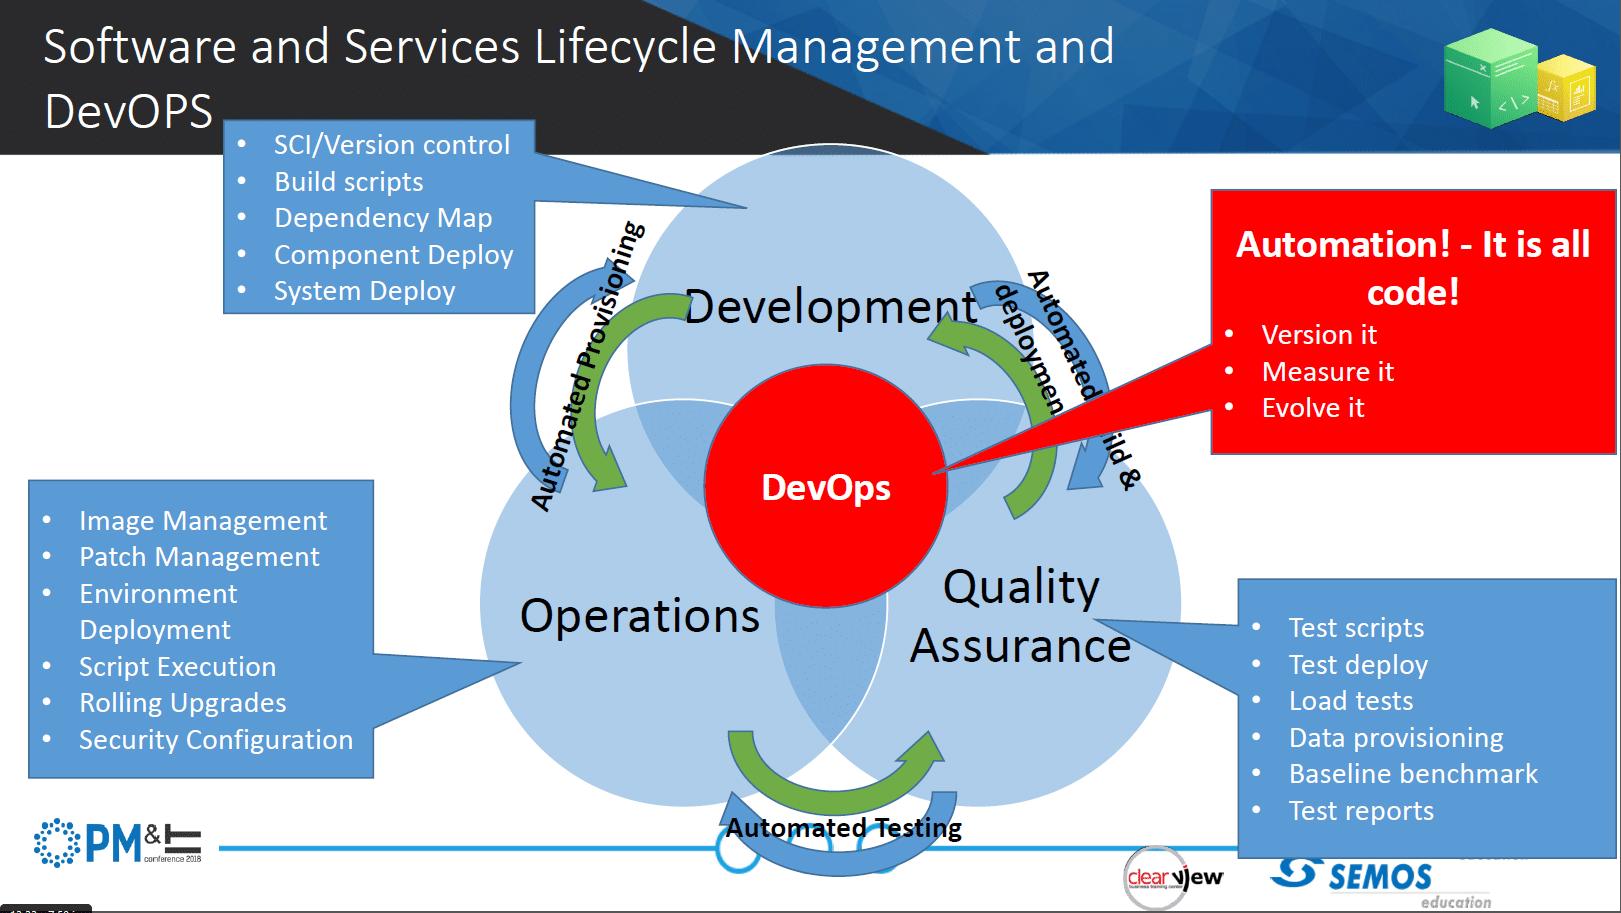 DevOps intersection diagram